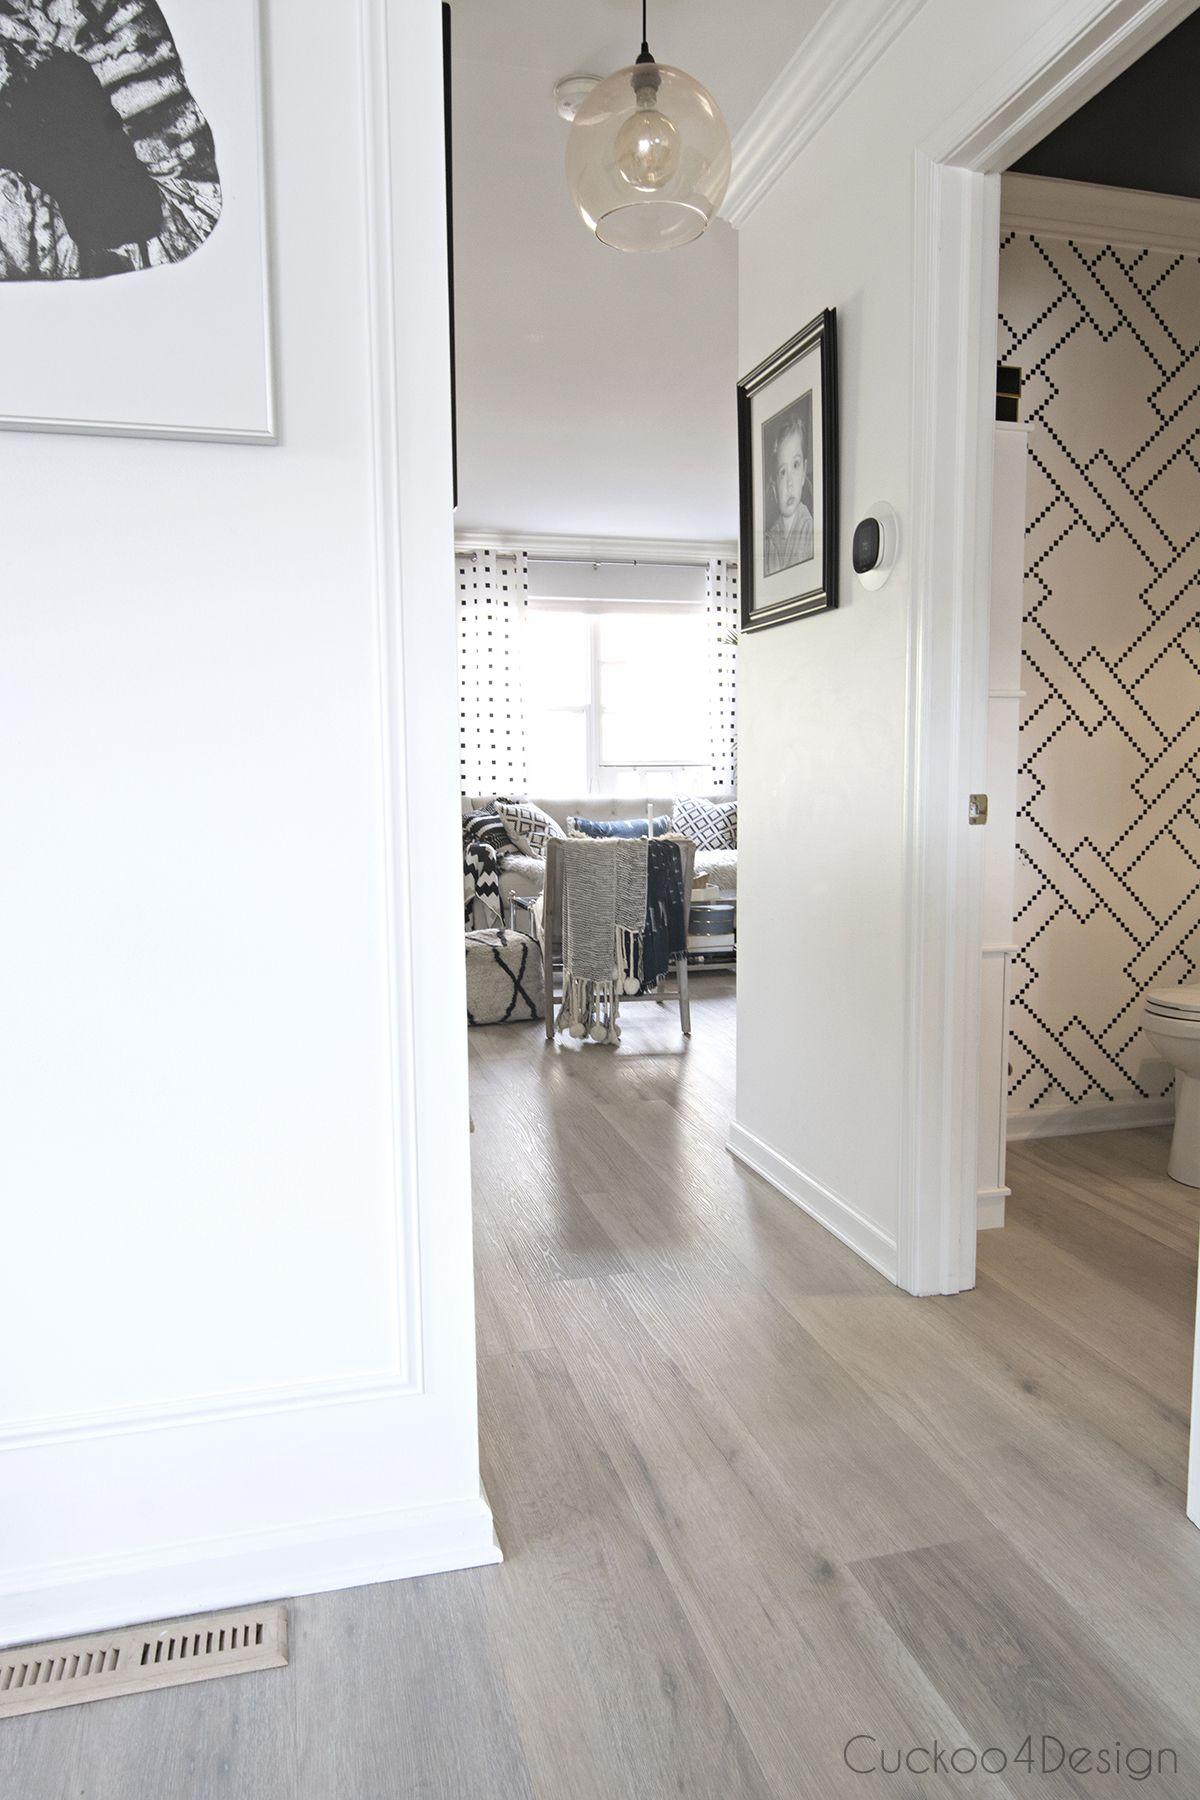 Photo of Why I chose Karndean vinyl wood plank flooring | Cuckoo4Design